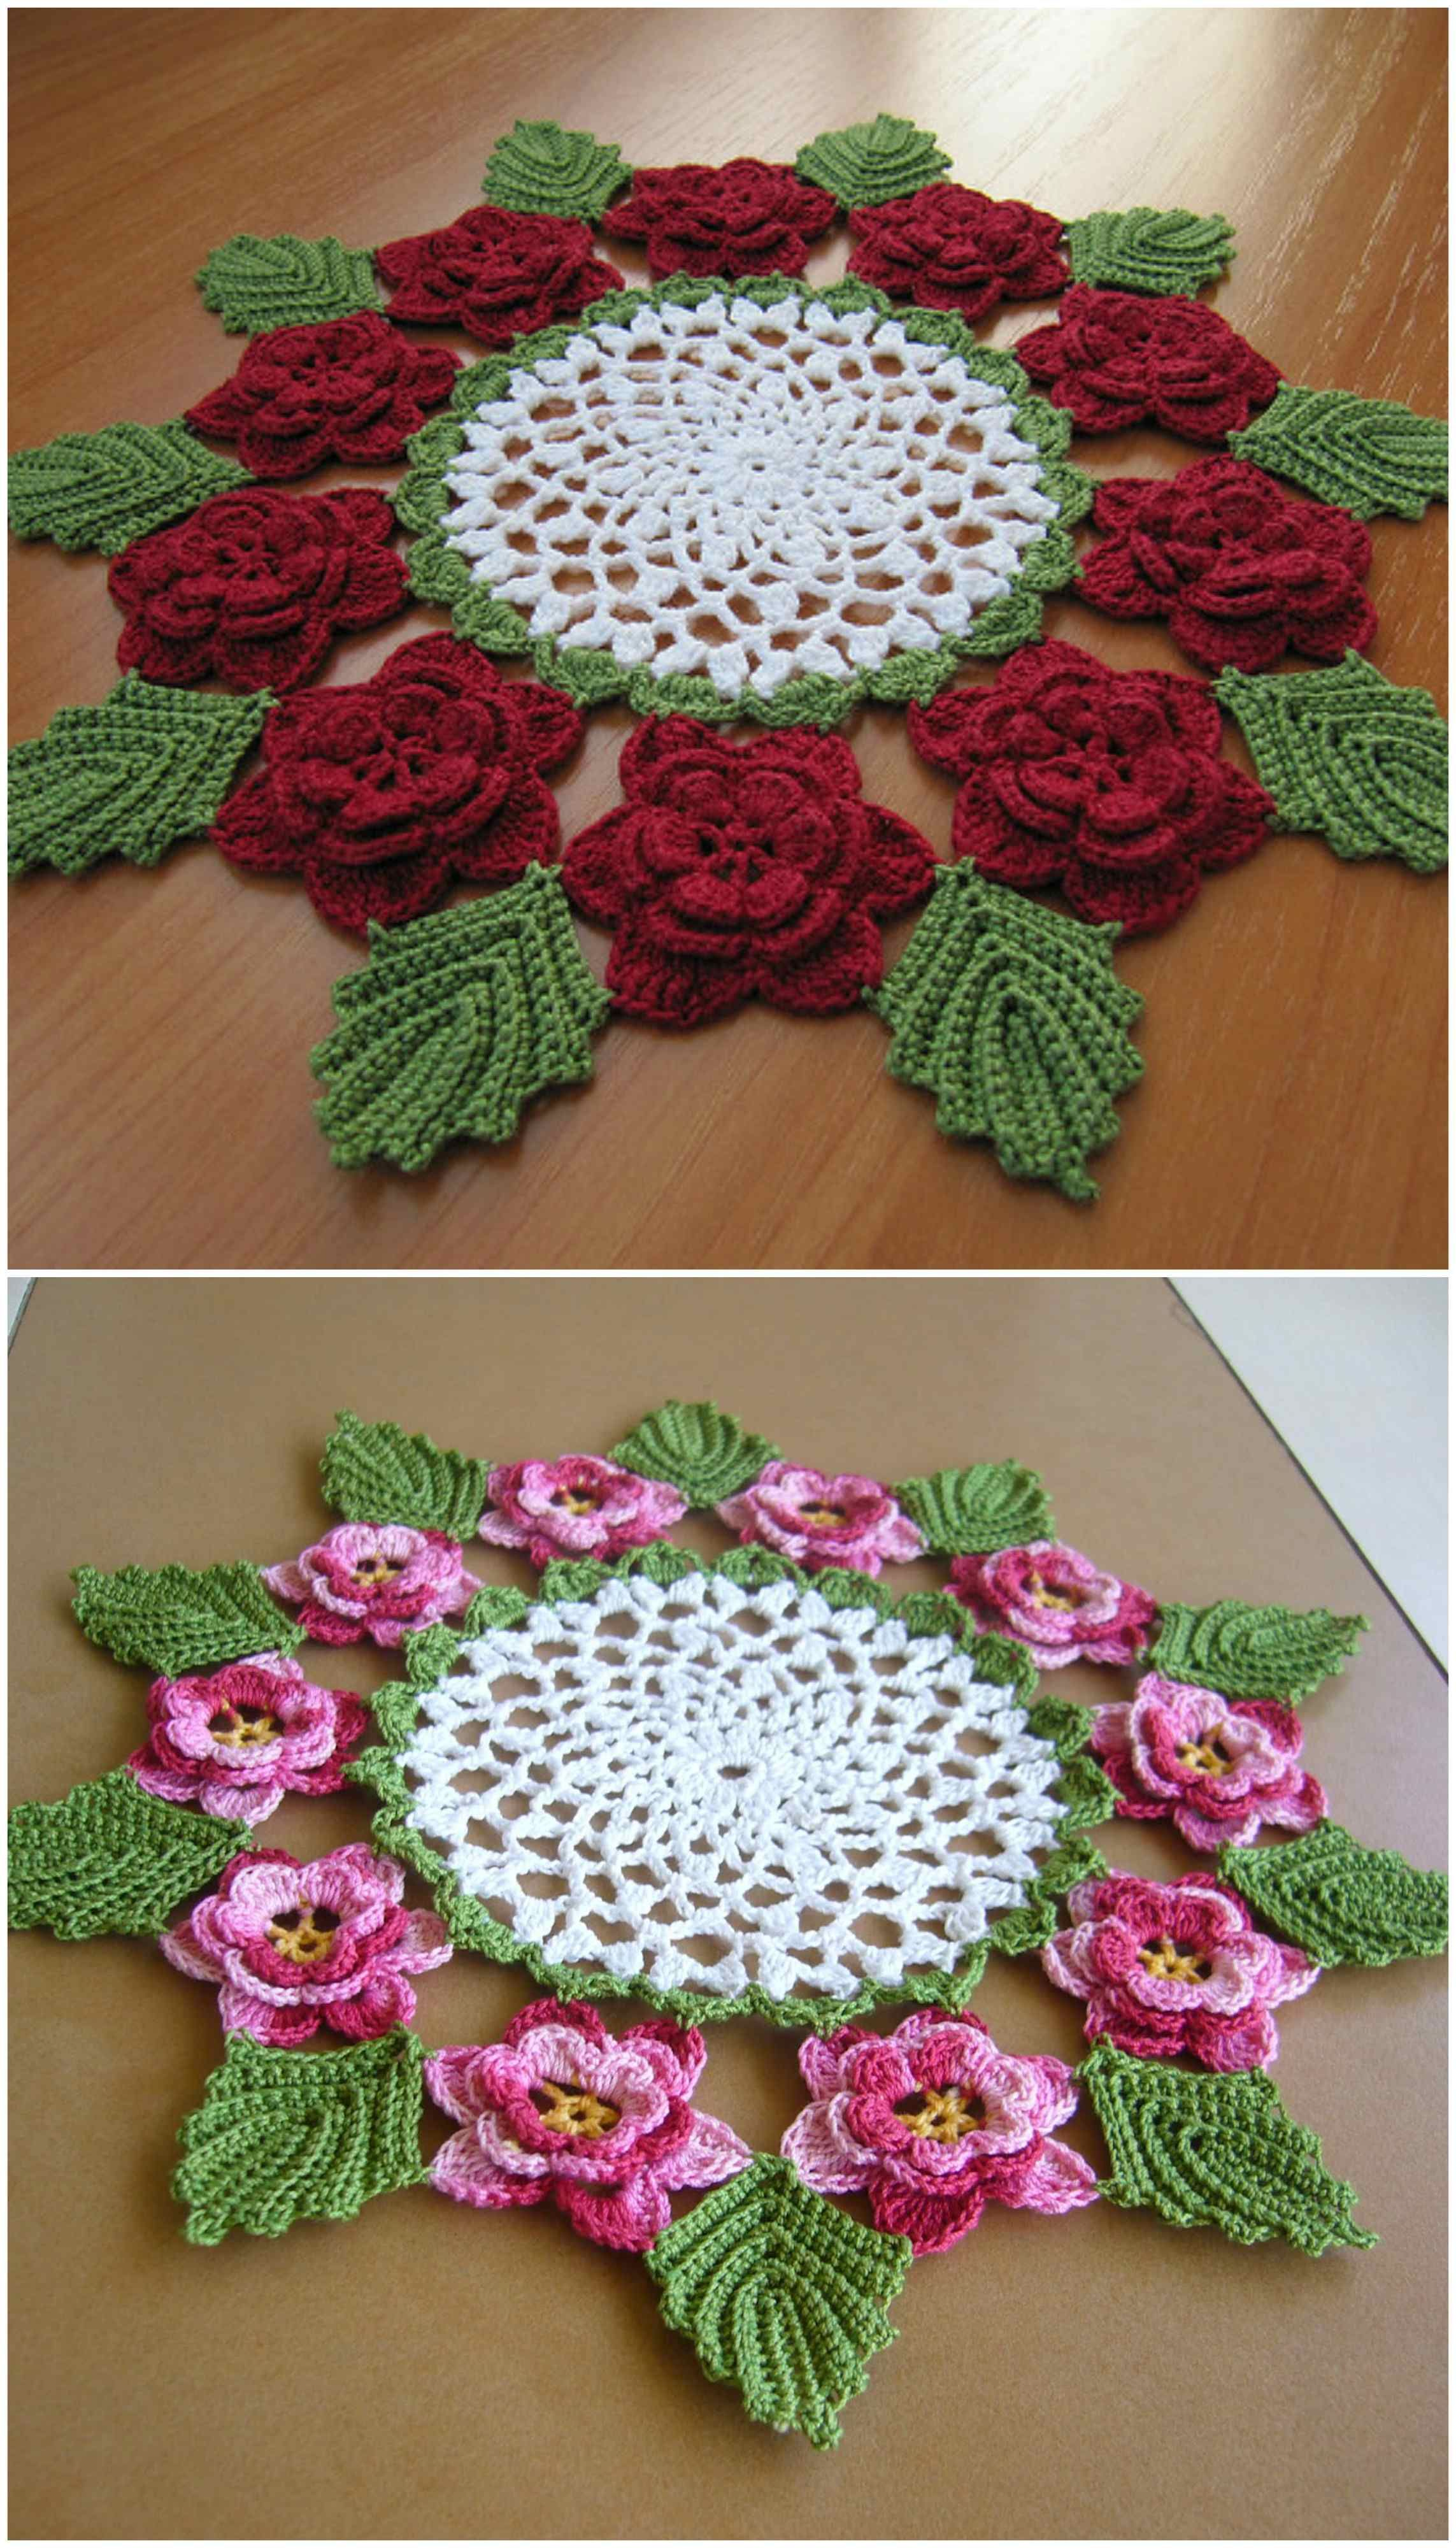 The Rose Doily Craft Ideas Doilies Crochet Doilies Crafts